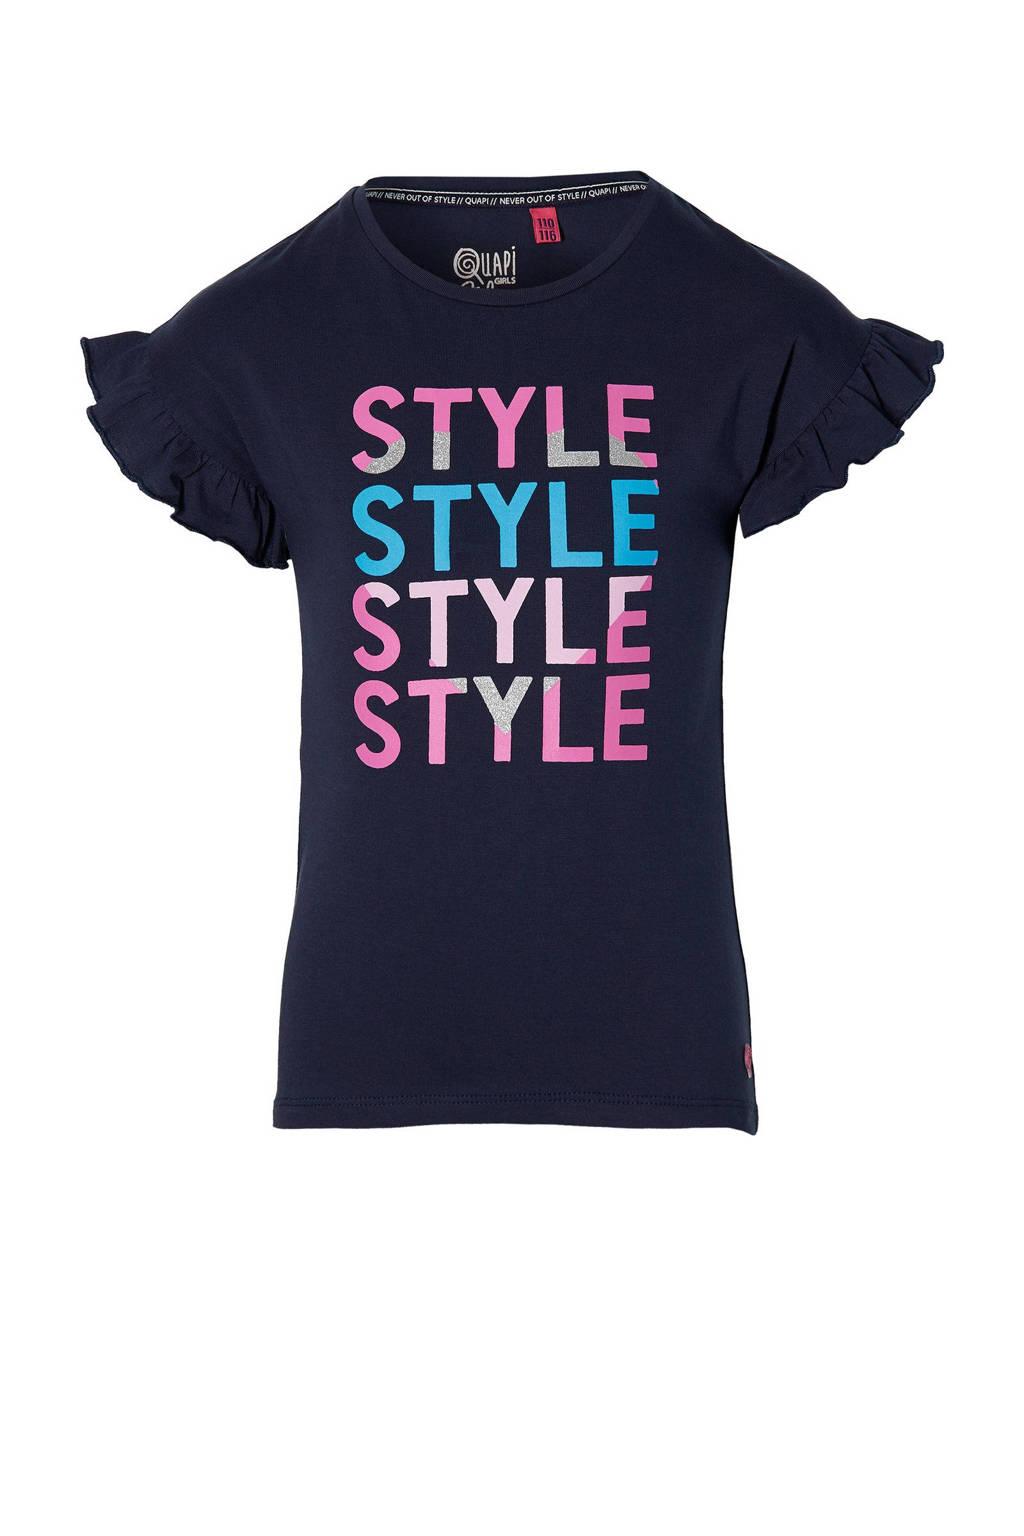 Quapi Girls T-shirt Fenja met tekst en ruches donkerblauw, Donkerblauw